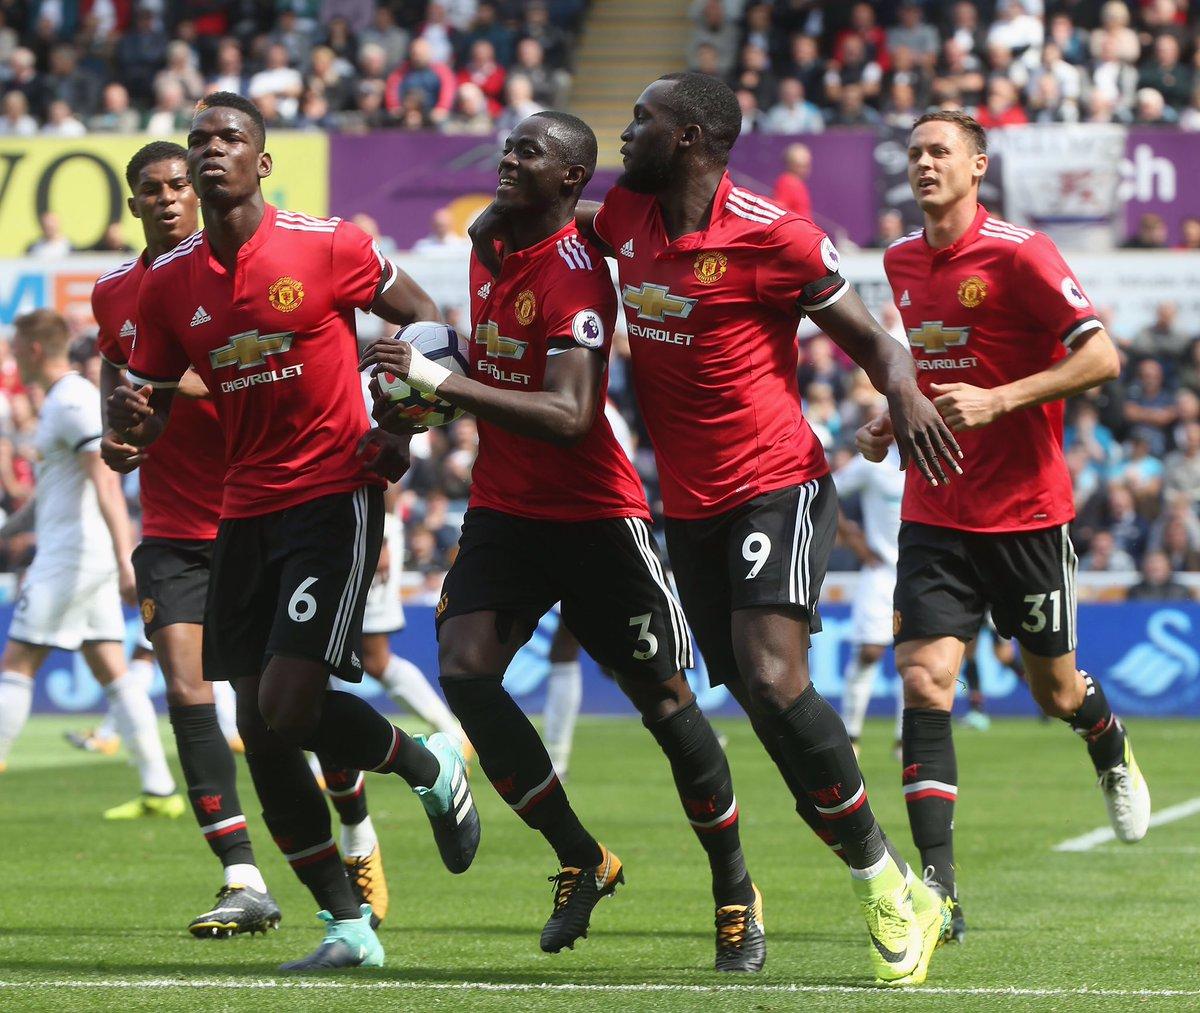 #PremierLeague  RESULTADOS DE LA J2:   #Swansea 0-4 #ManchesterUnited #Southampton 3-2 #WestHam #Bournemouth 0-2 #Watford  #20Agopic.twitter.com/gXnyZ0YmXy